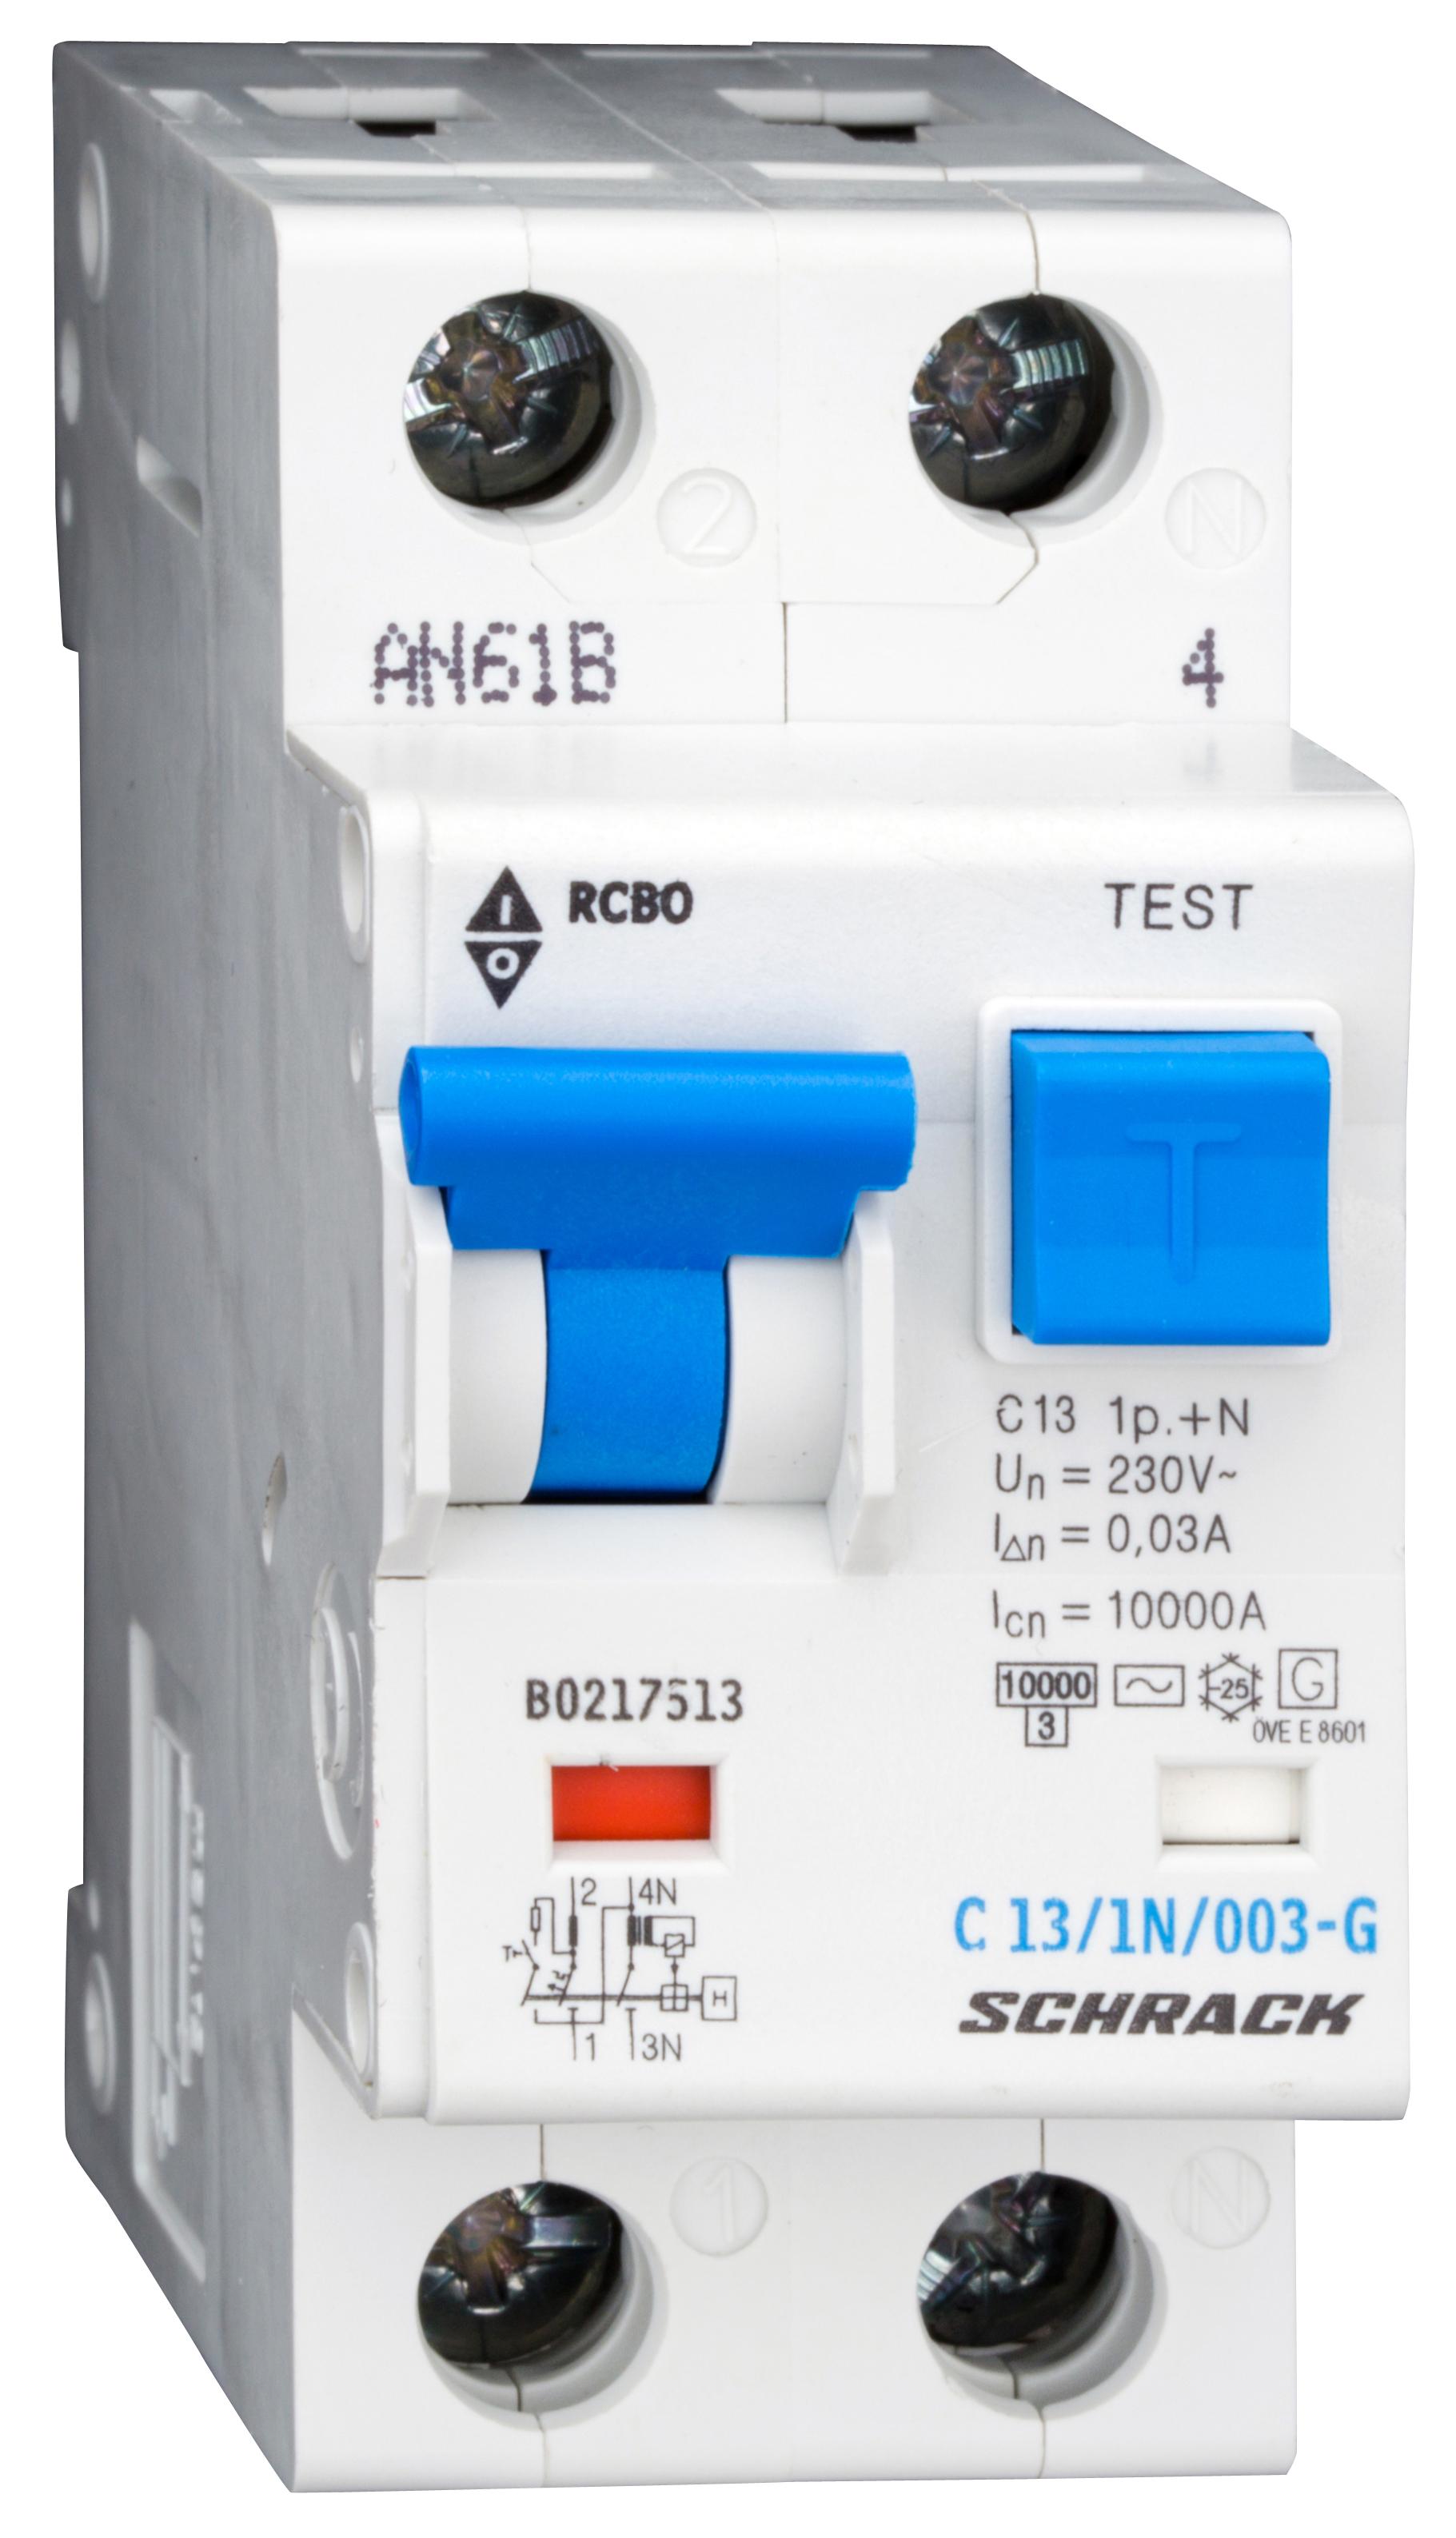 1 Stk LS-FI-Schalter,Kennl. C, 13A,30mA,1-polig+N, Bauart G,Typ AC BO217513--